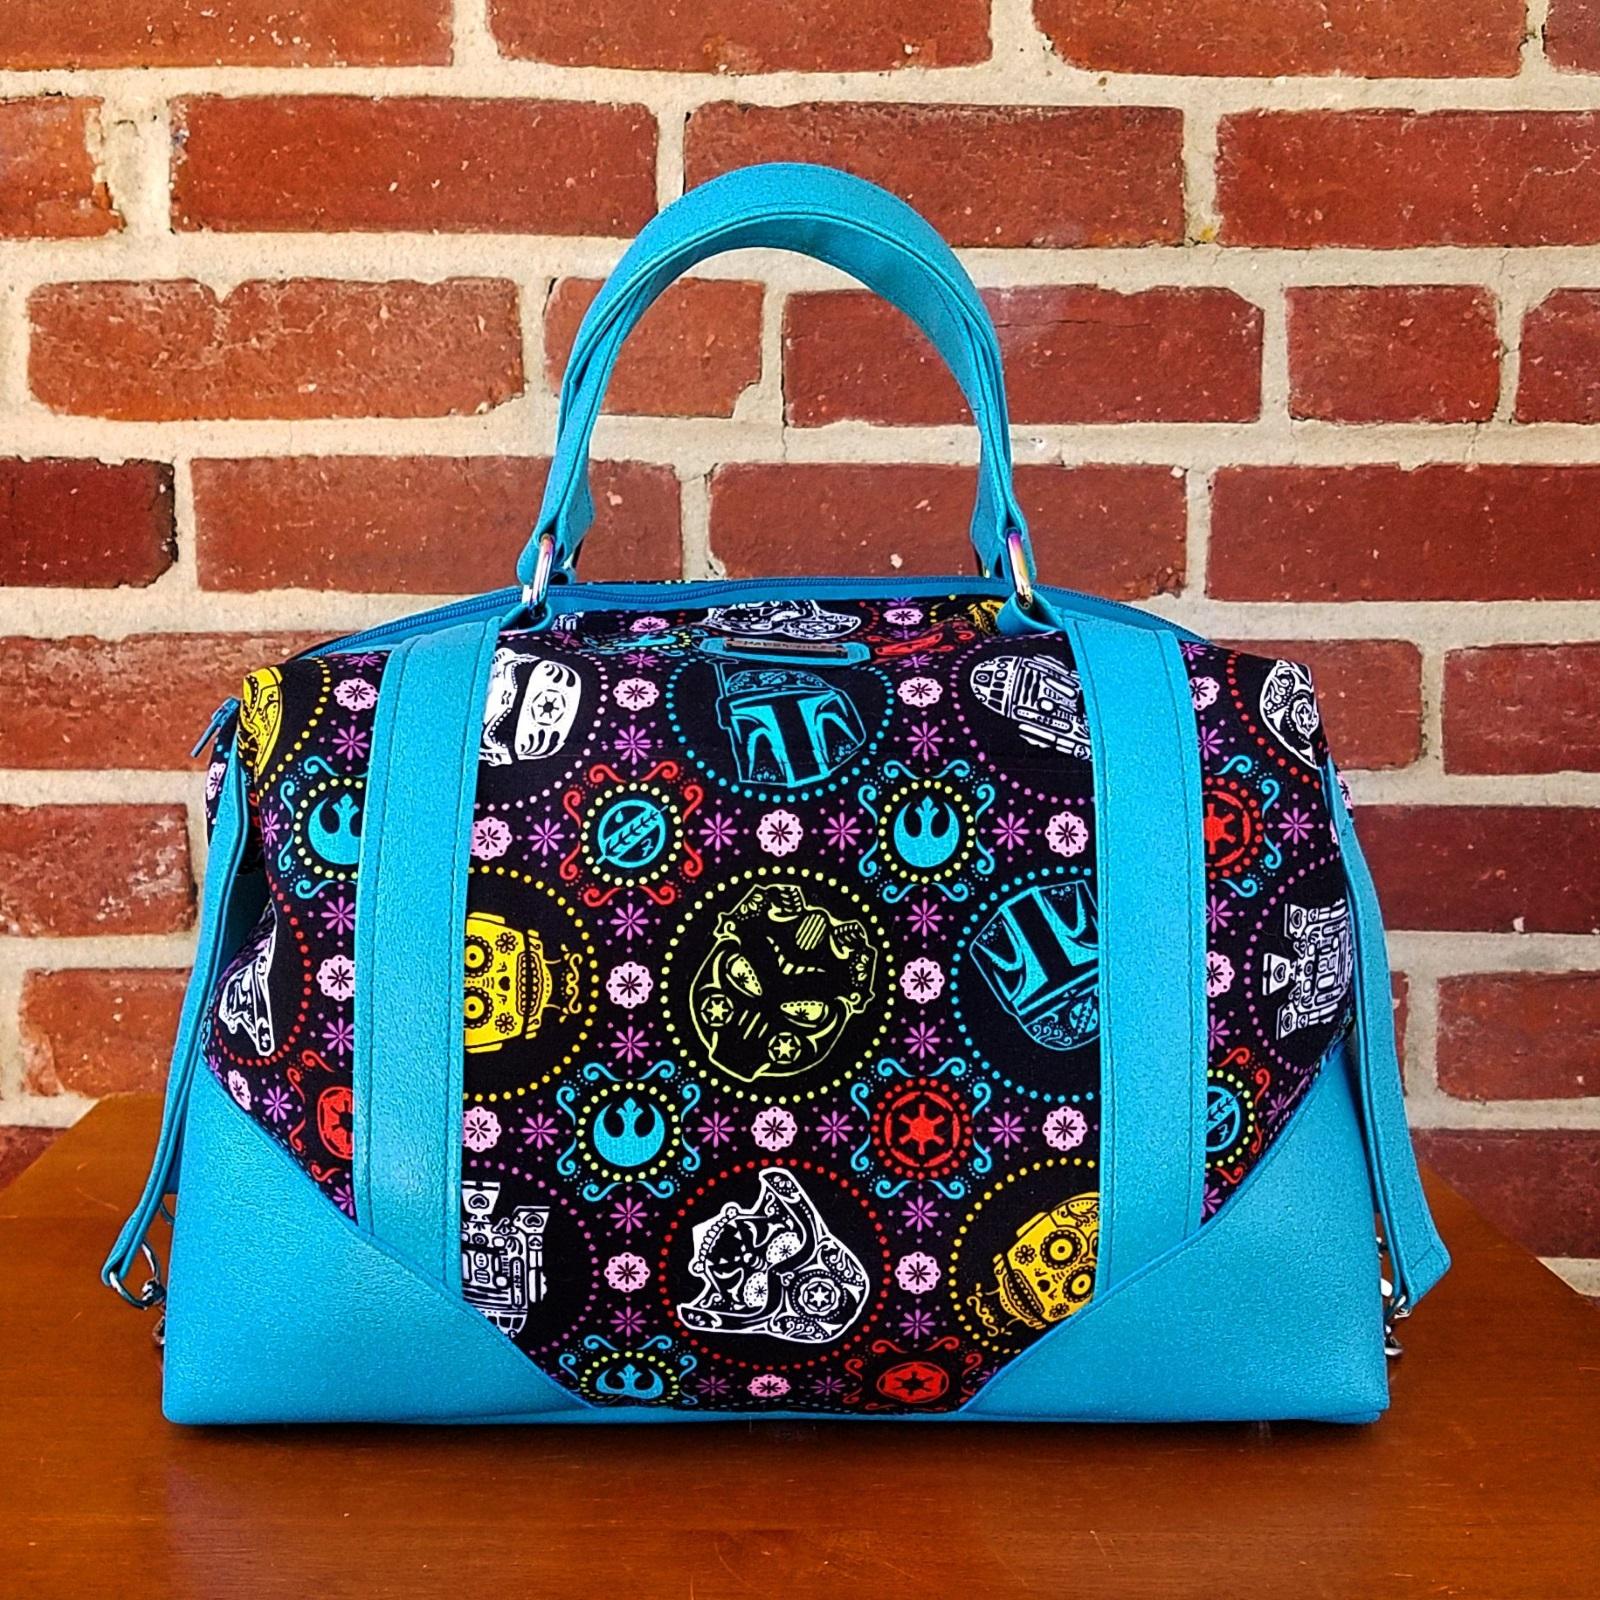 Star Wars Sugar Skull Print Handbag by BenaeQuee Creations on Etsy